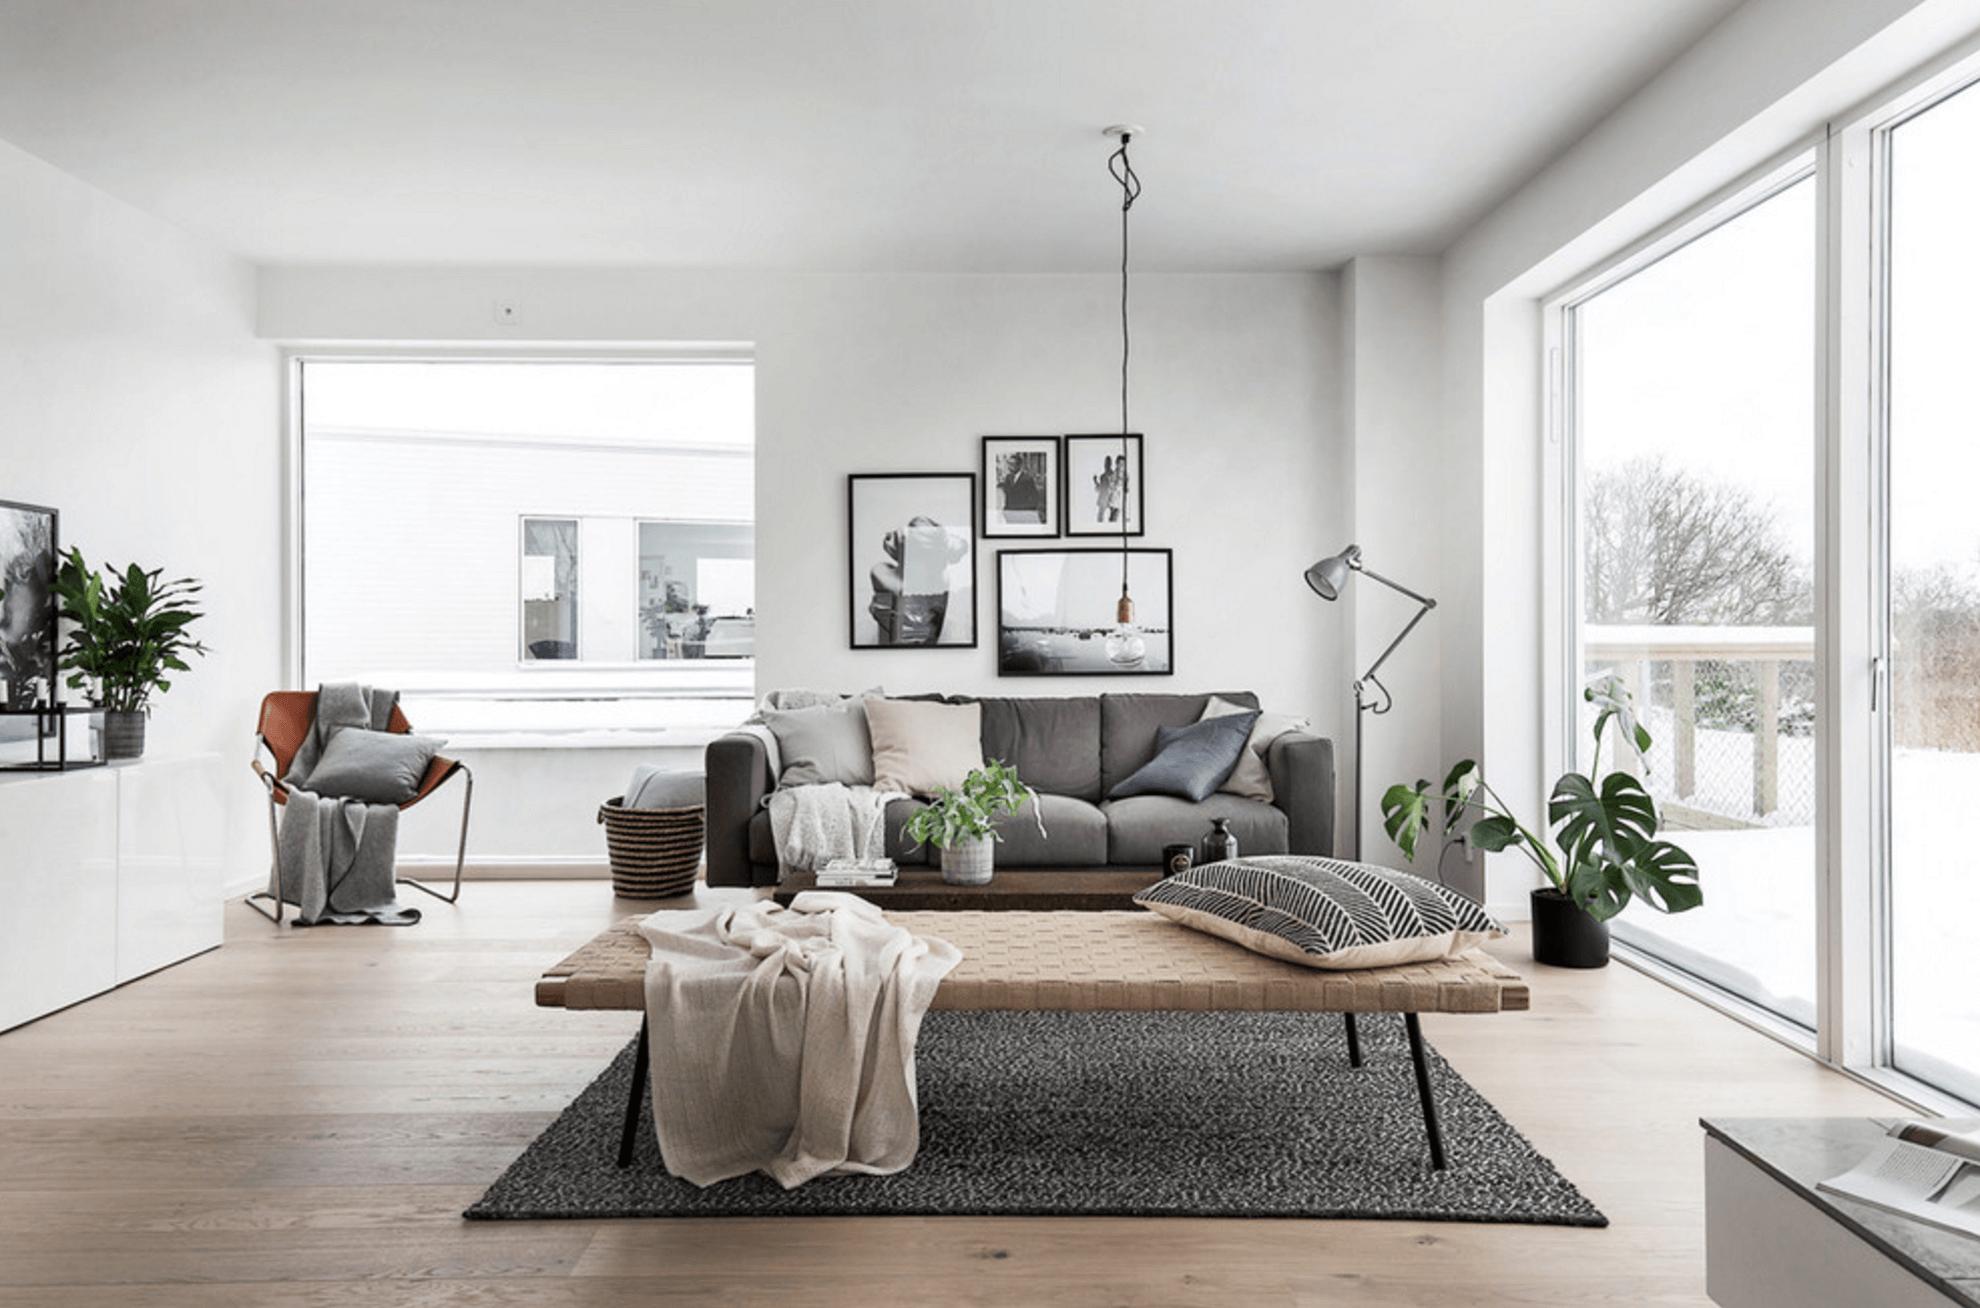 Cresleigh Homes on | Pinterest | Scandinavian interior design ...